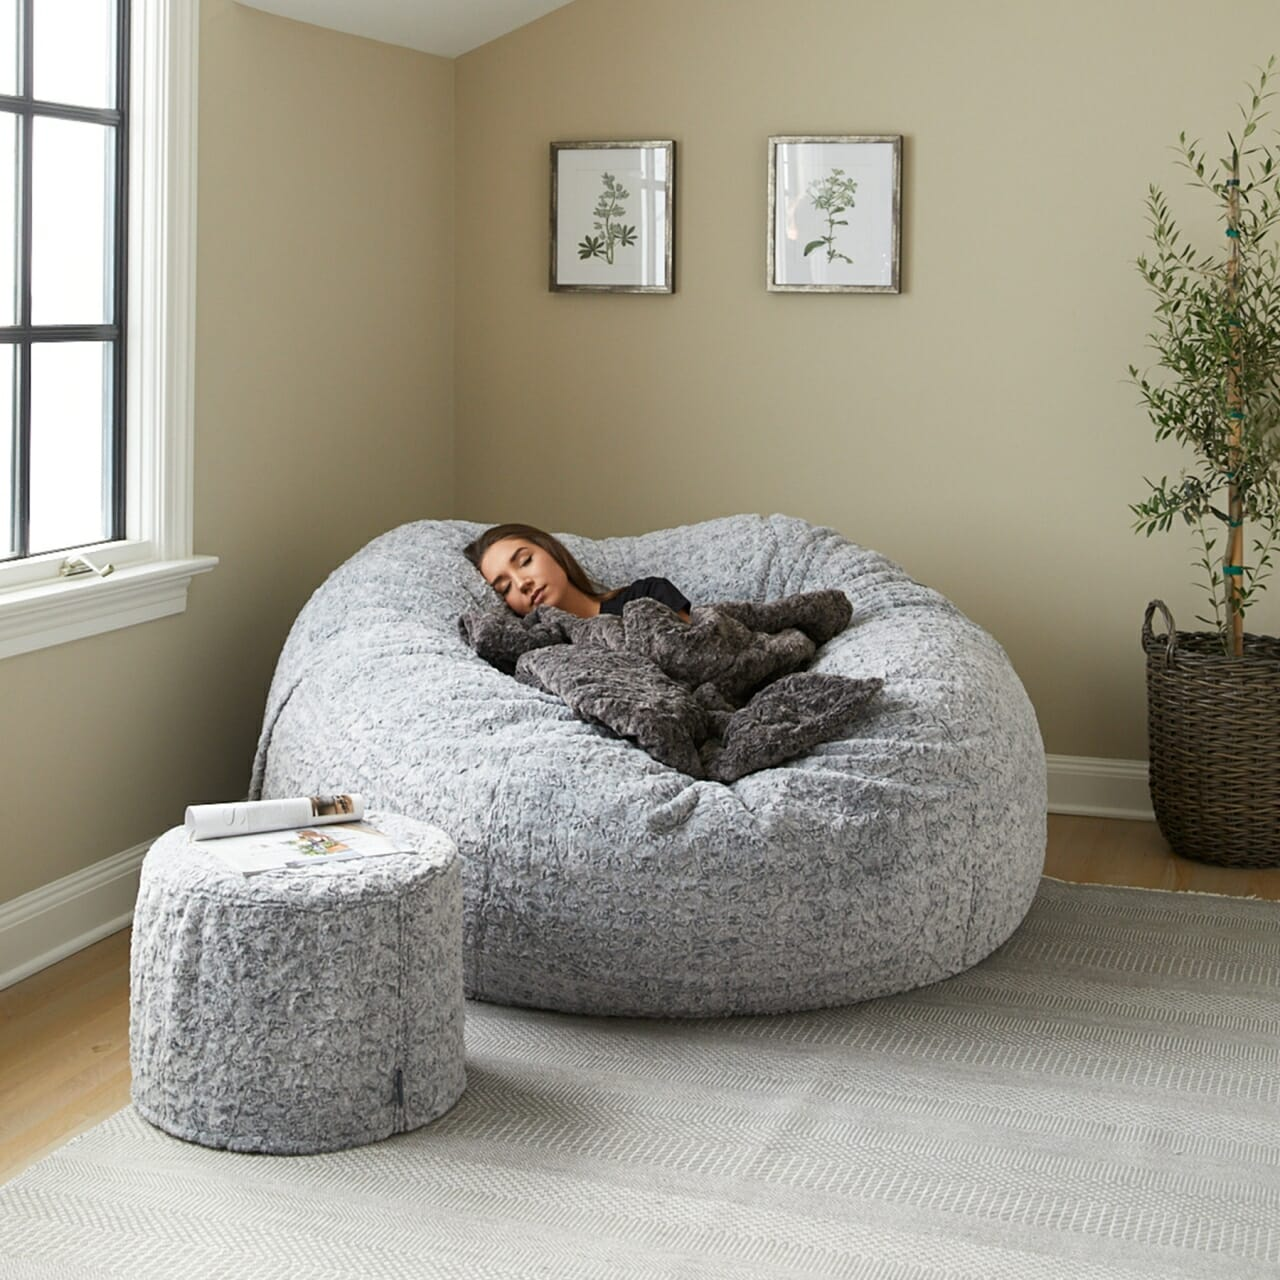 A woman sleeping cozily in a Lovesac Sac Bundle.